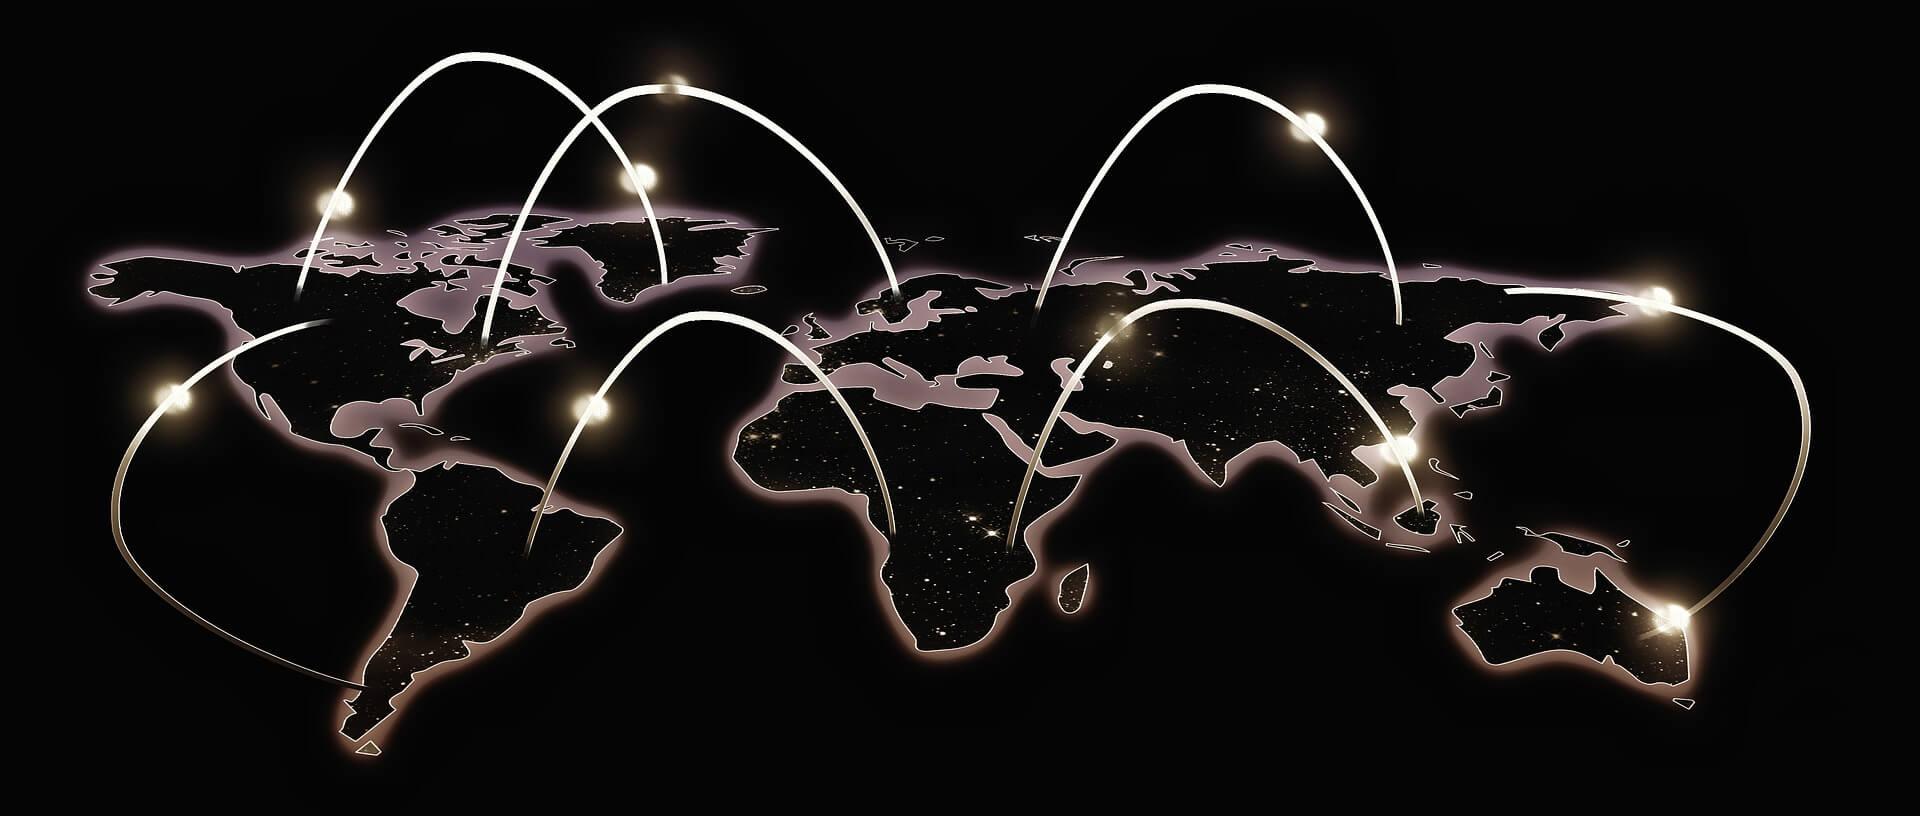 Freedom of Internet